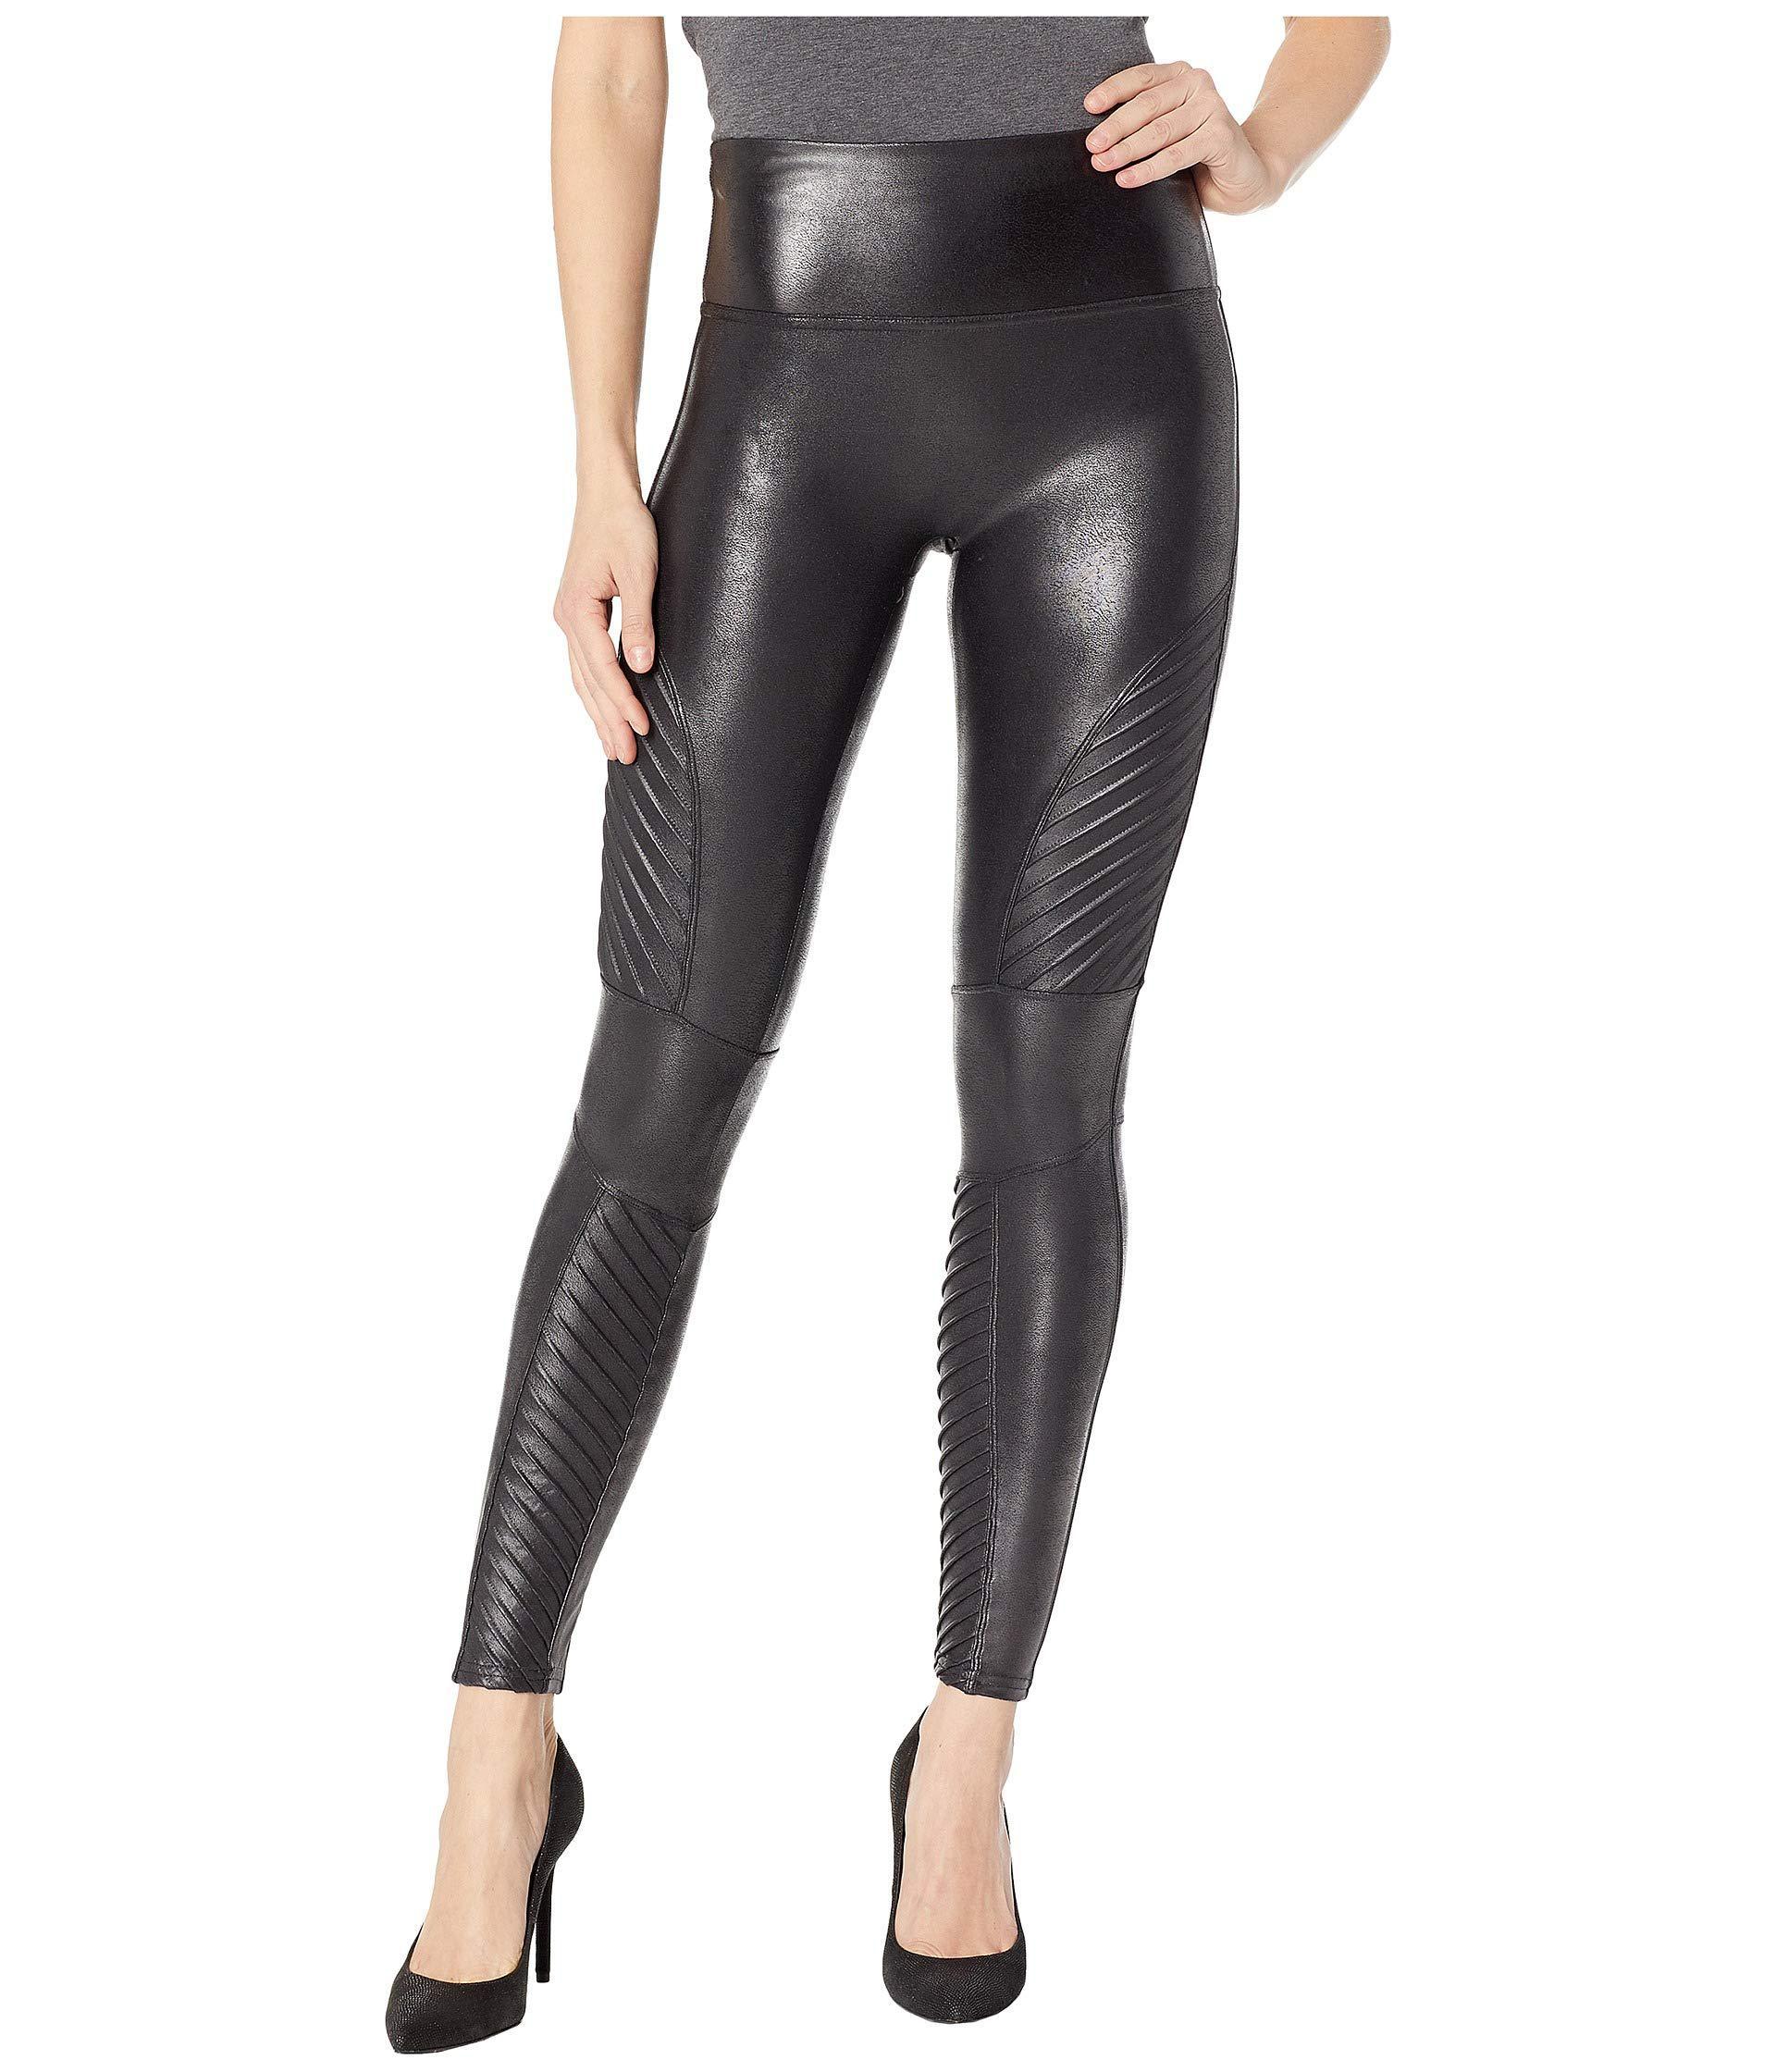 829cbf2416f Lyst - Spanx Faux Leather Leggings Moto Petite (black) Women s ...